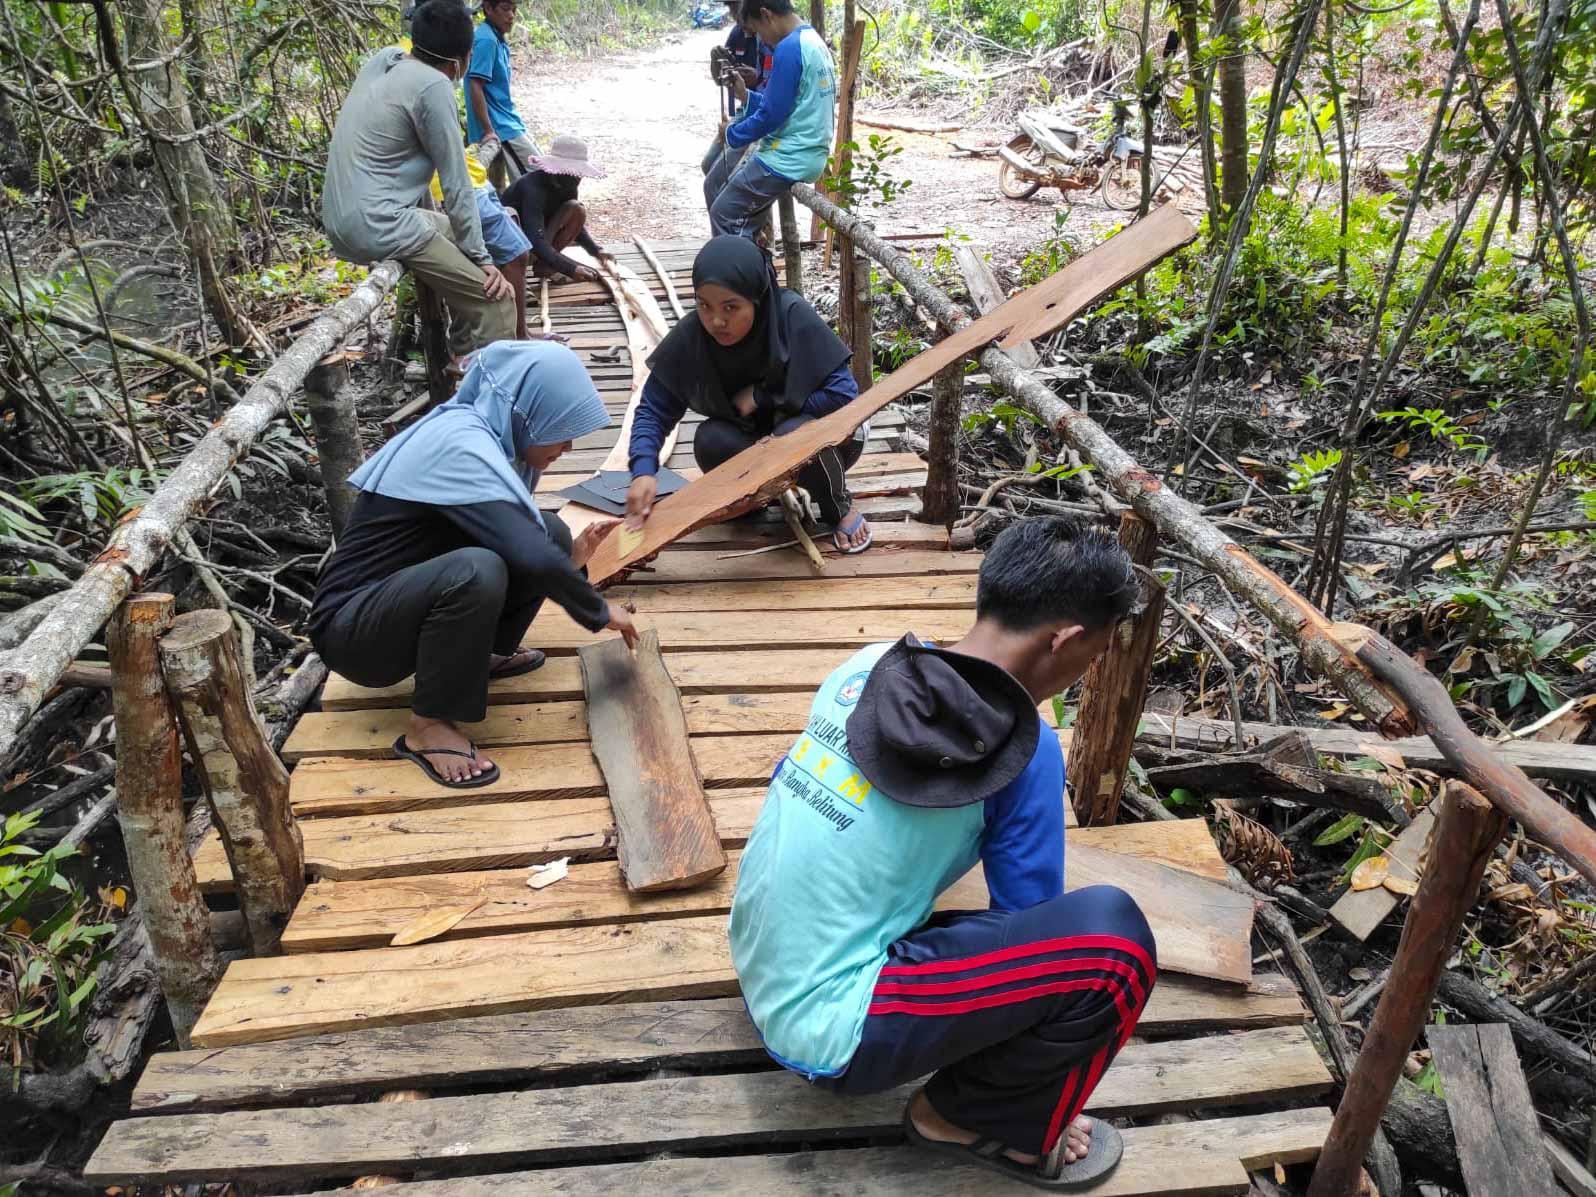 Daya Tarik Wisata Kota Kapur Bertambah, Mahasiswa KKN UBB Bangun Spot Foto di Hutan Mangrove Sungai Menduk